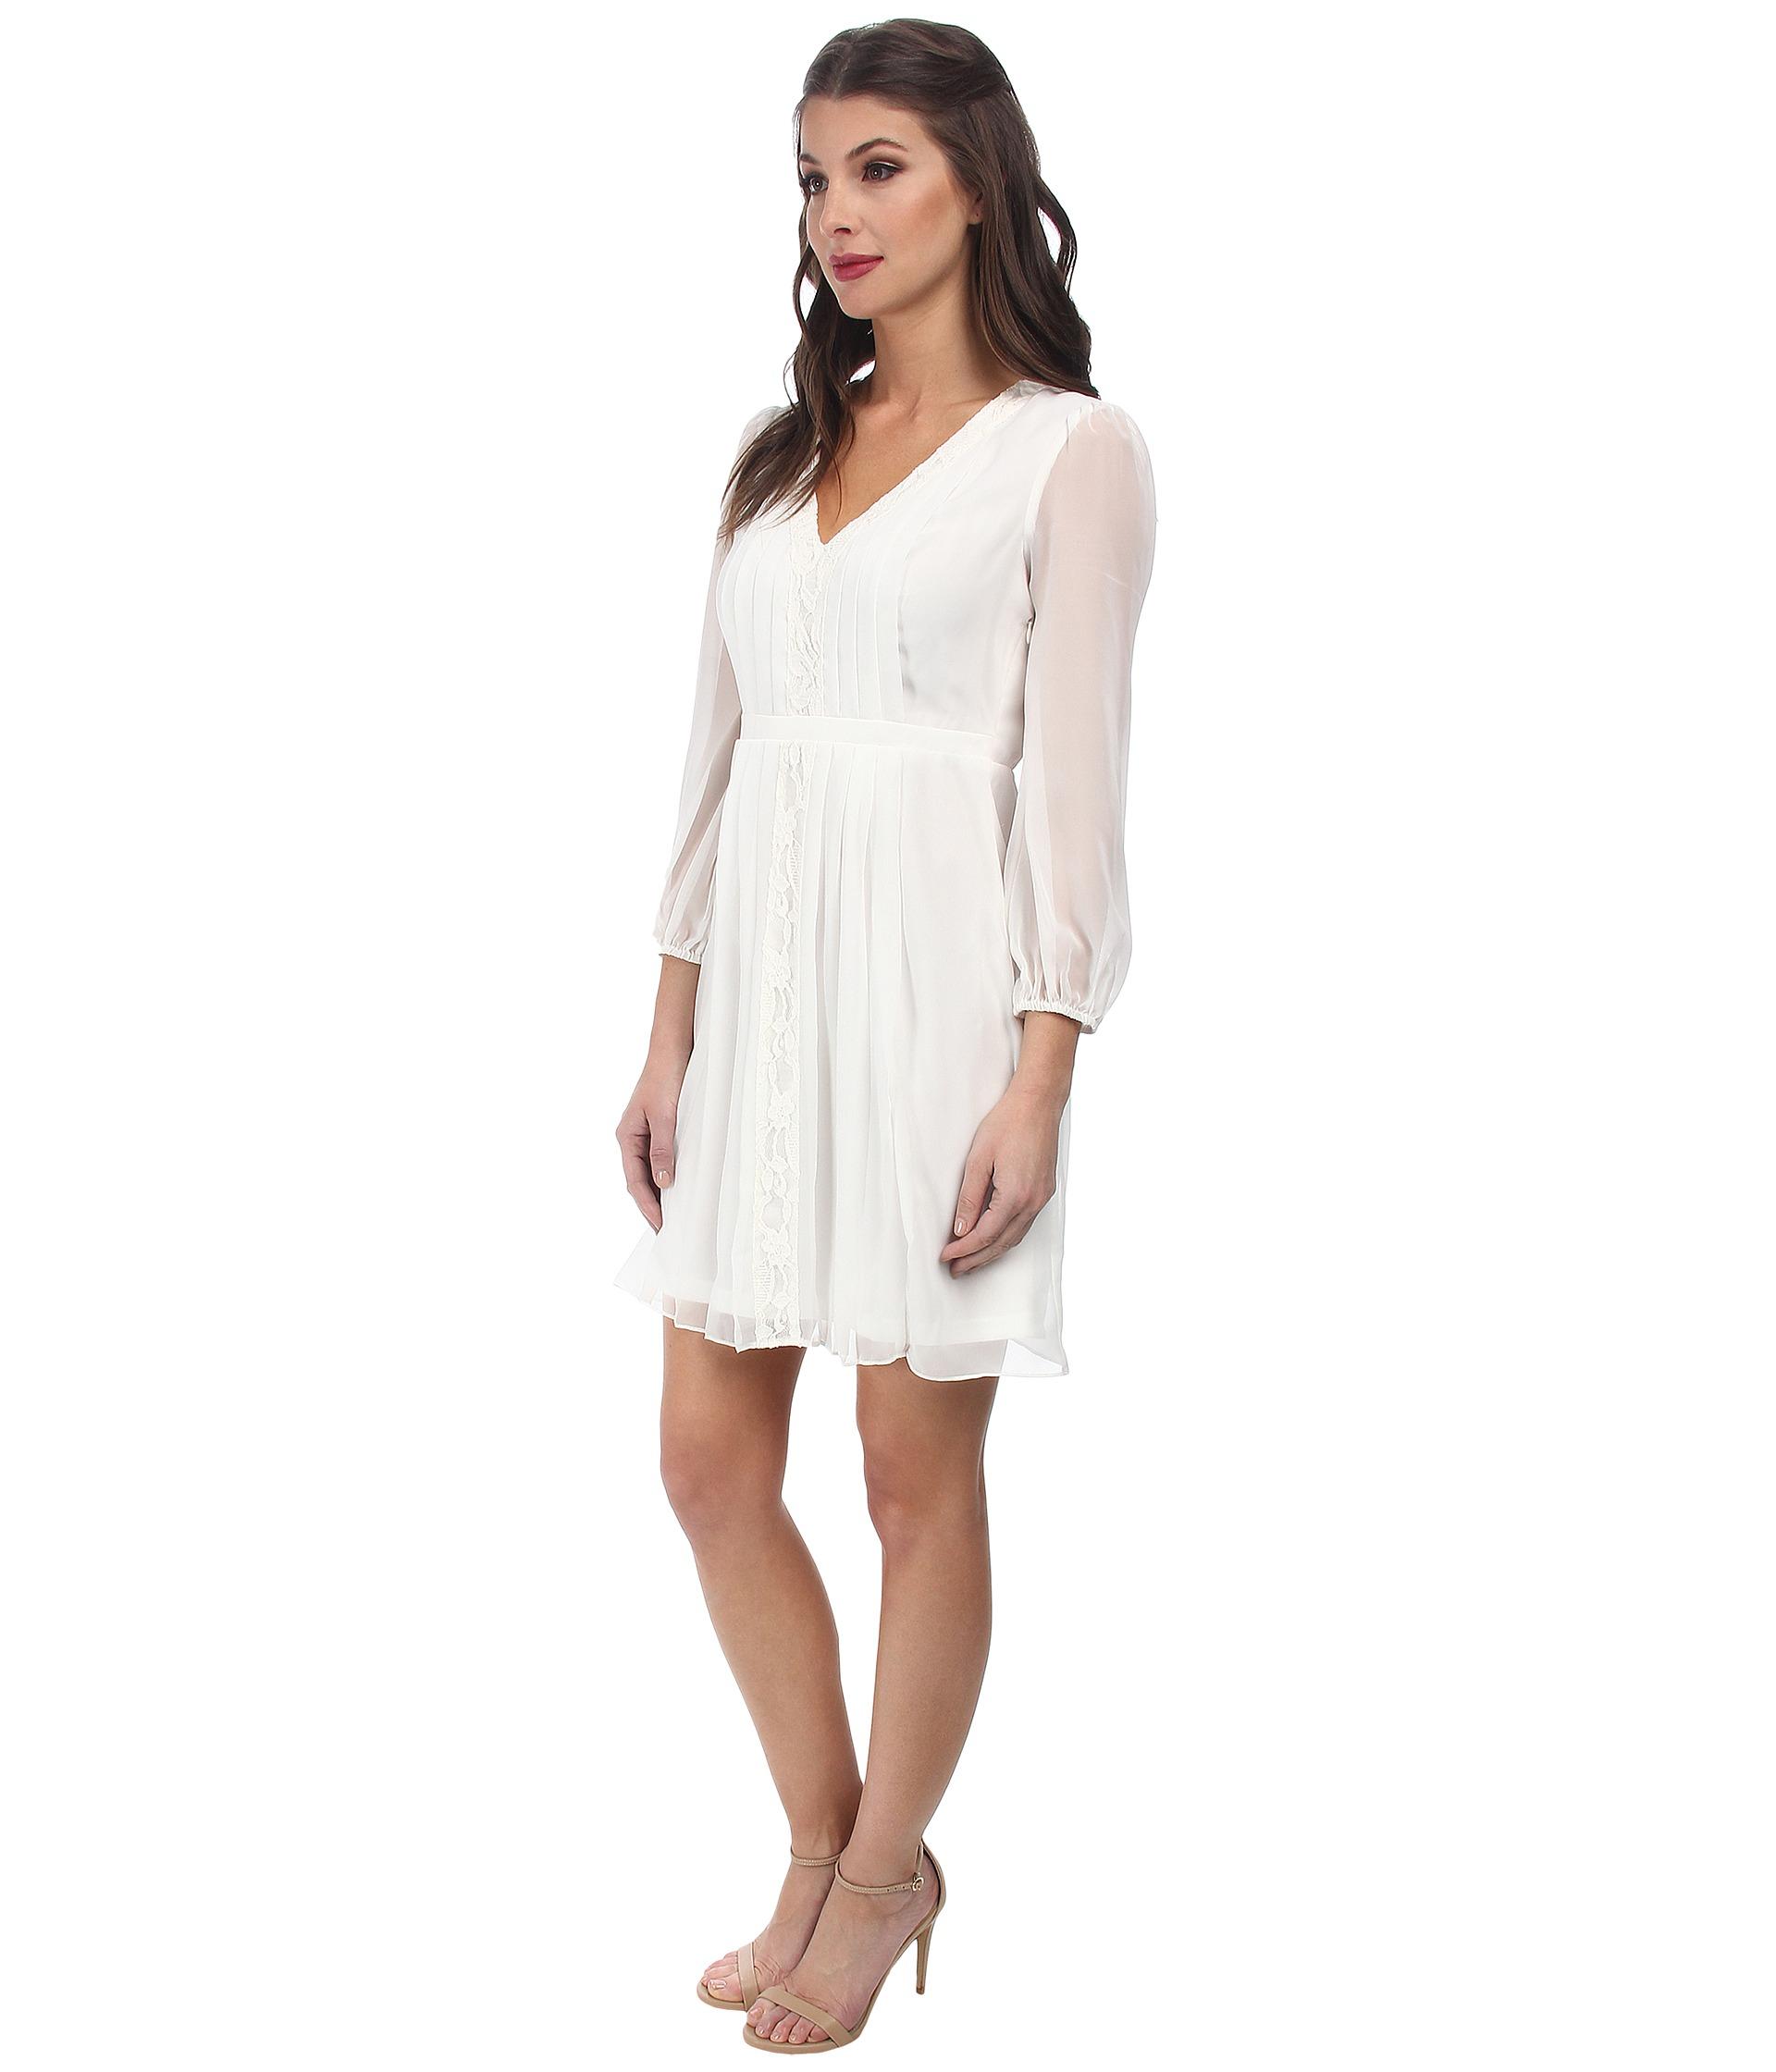 5c4fc91c9 Jessica Simpson 3/4 Sleeve Chiffon Dress Js5A7035 in White - Lyst